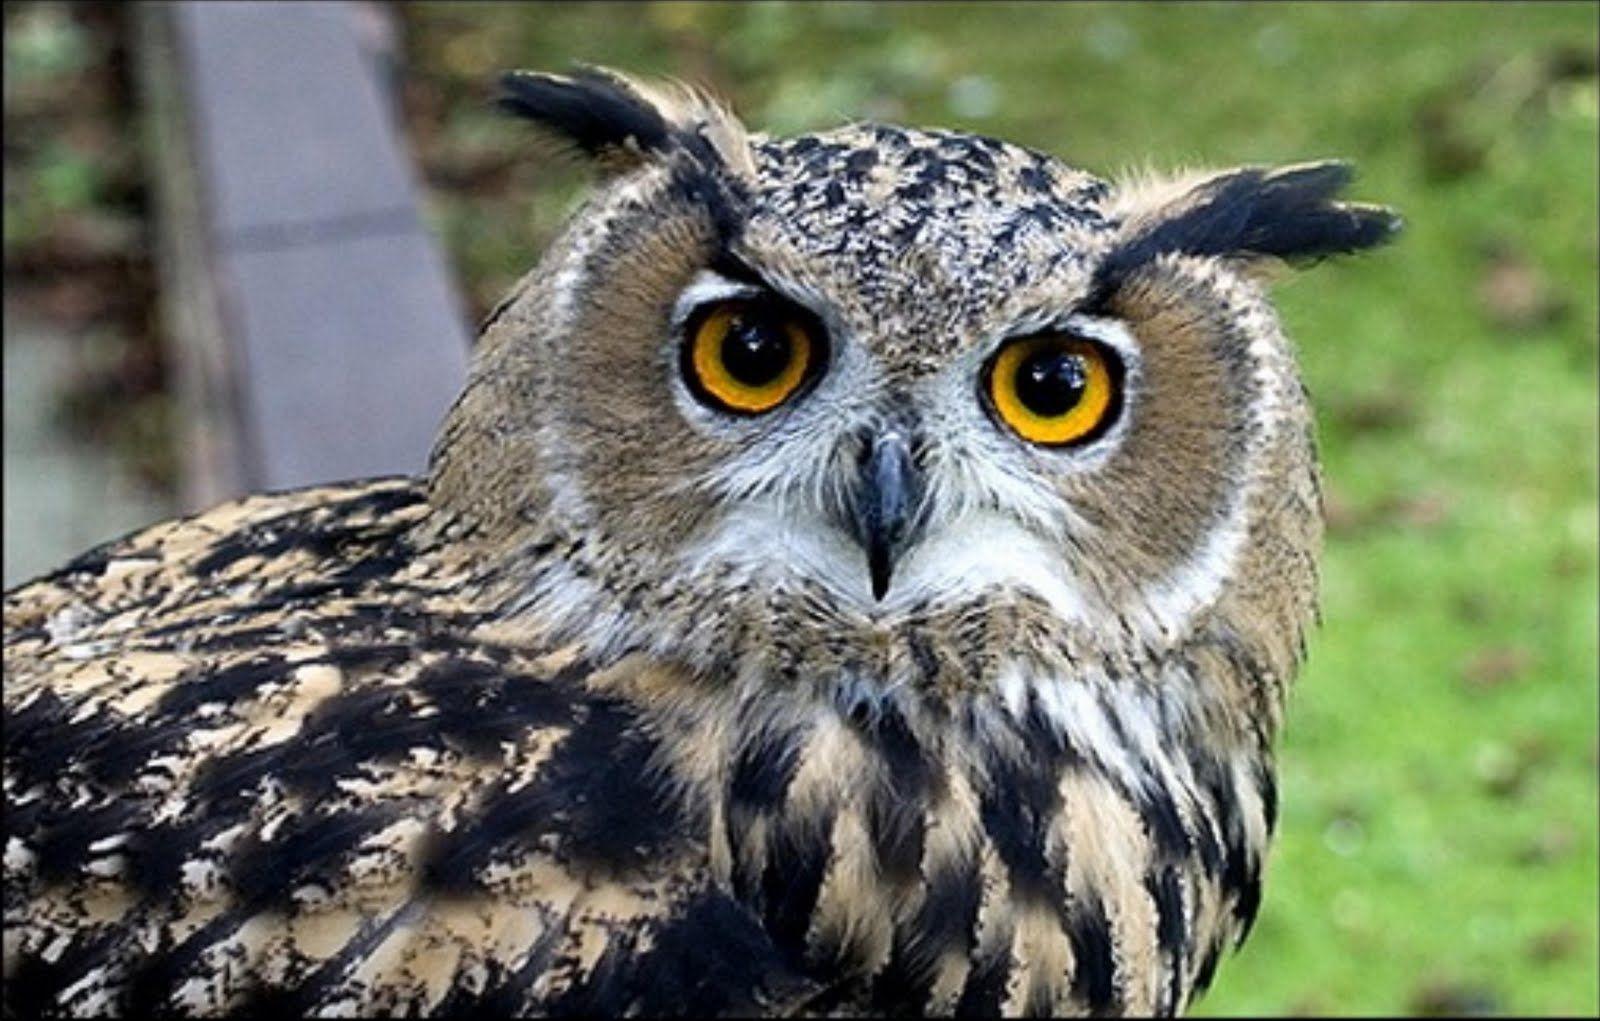 European Eagle Owl Owl pictures, Owl facts, Owl